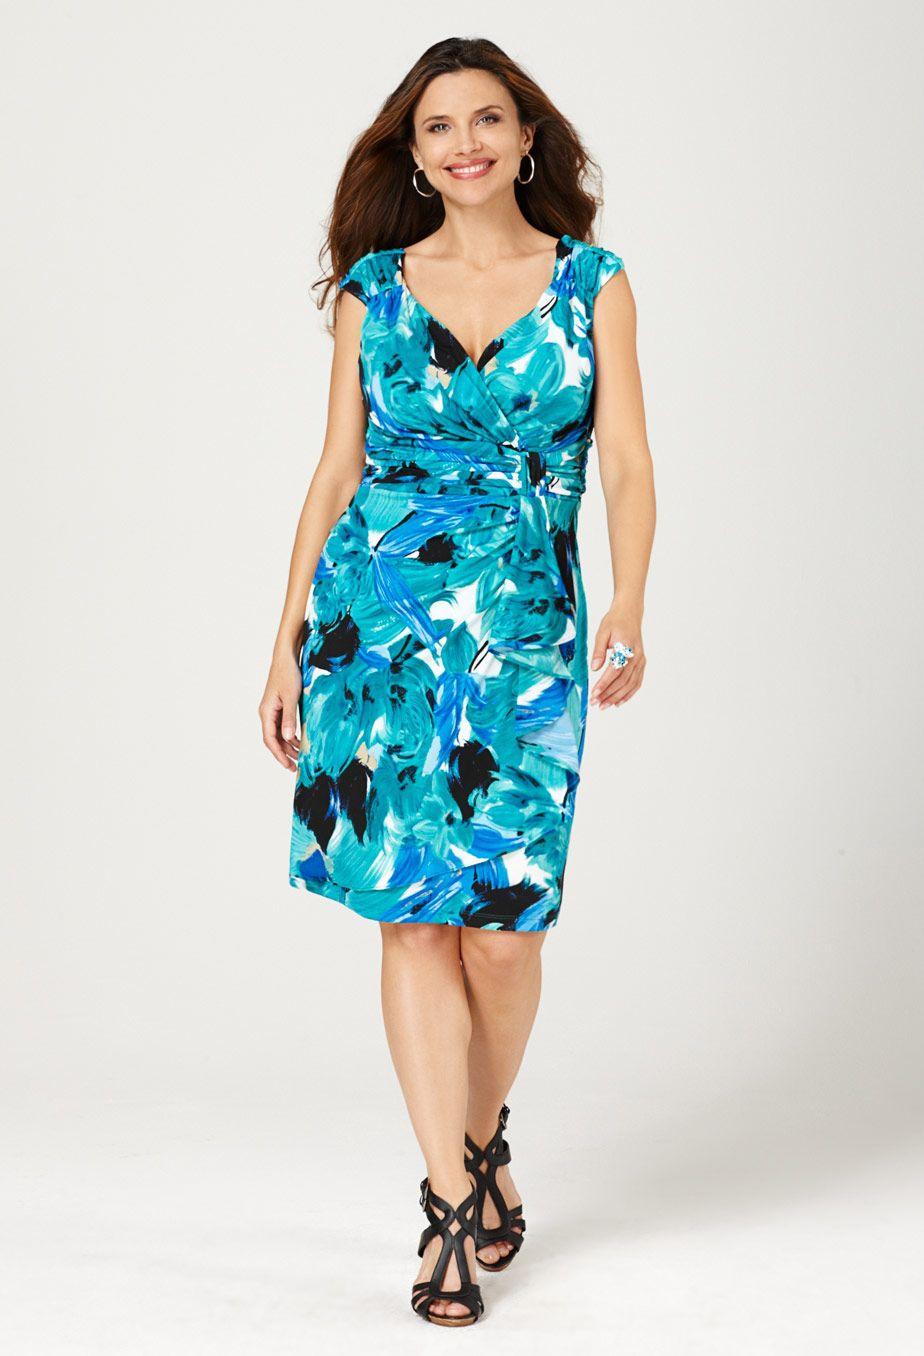 Plus Size Summer Dresses | DressedUpGirl.com